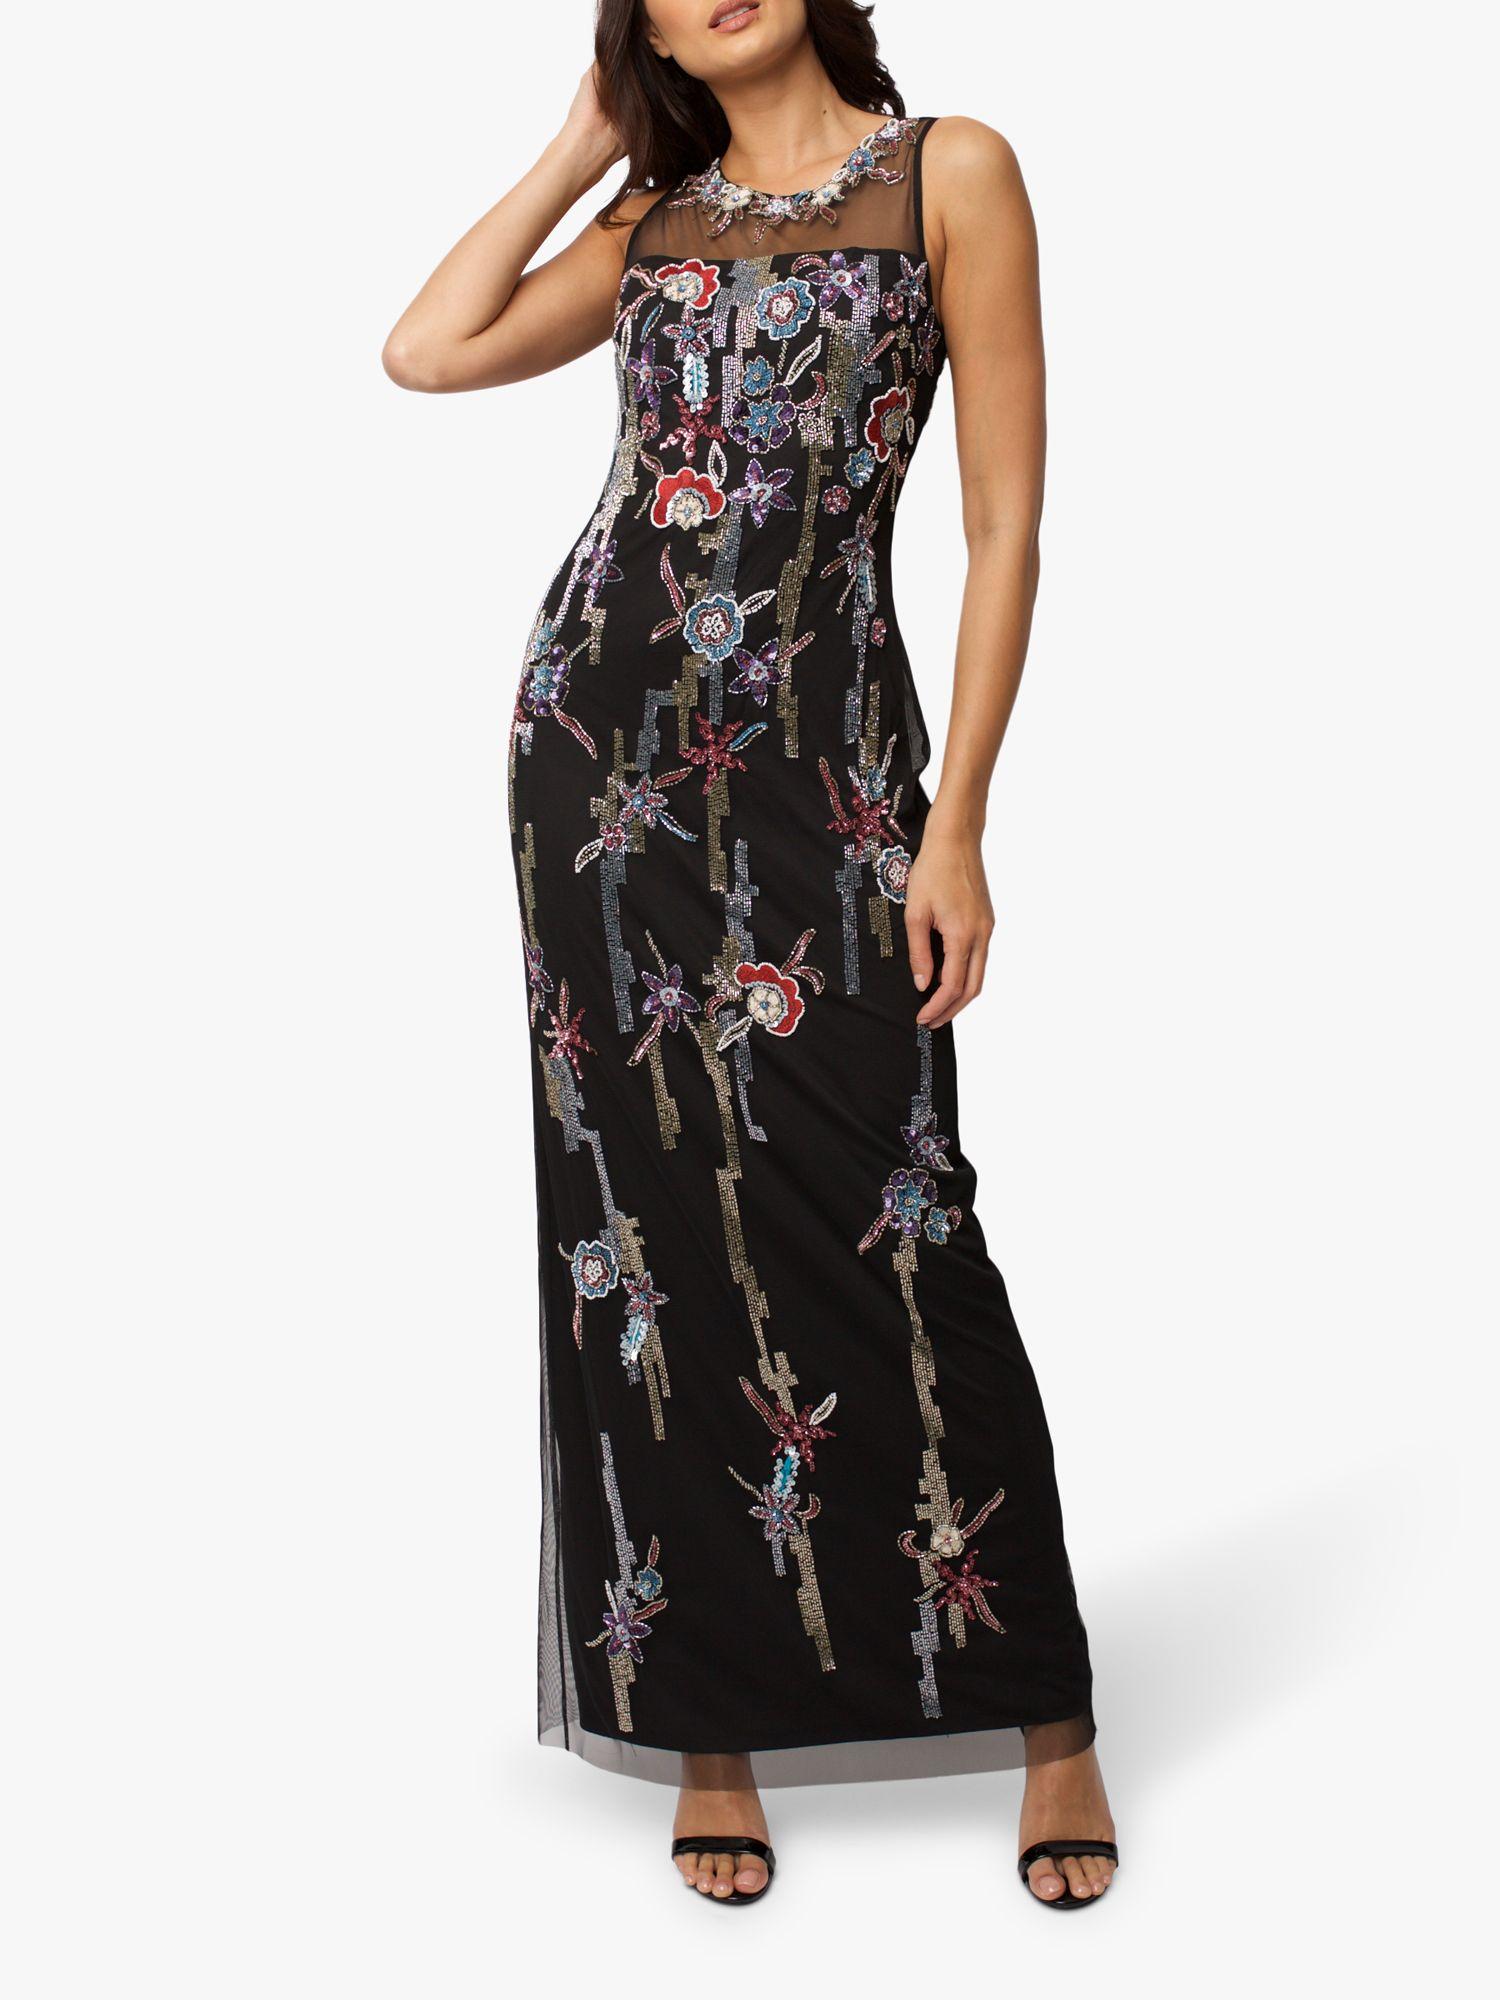 RAISHMA Raishma Evelyn Embellished Gown, Black/Multi